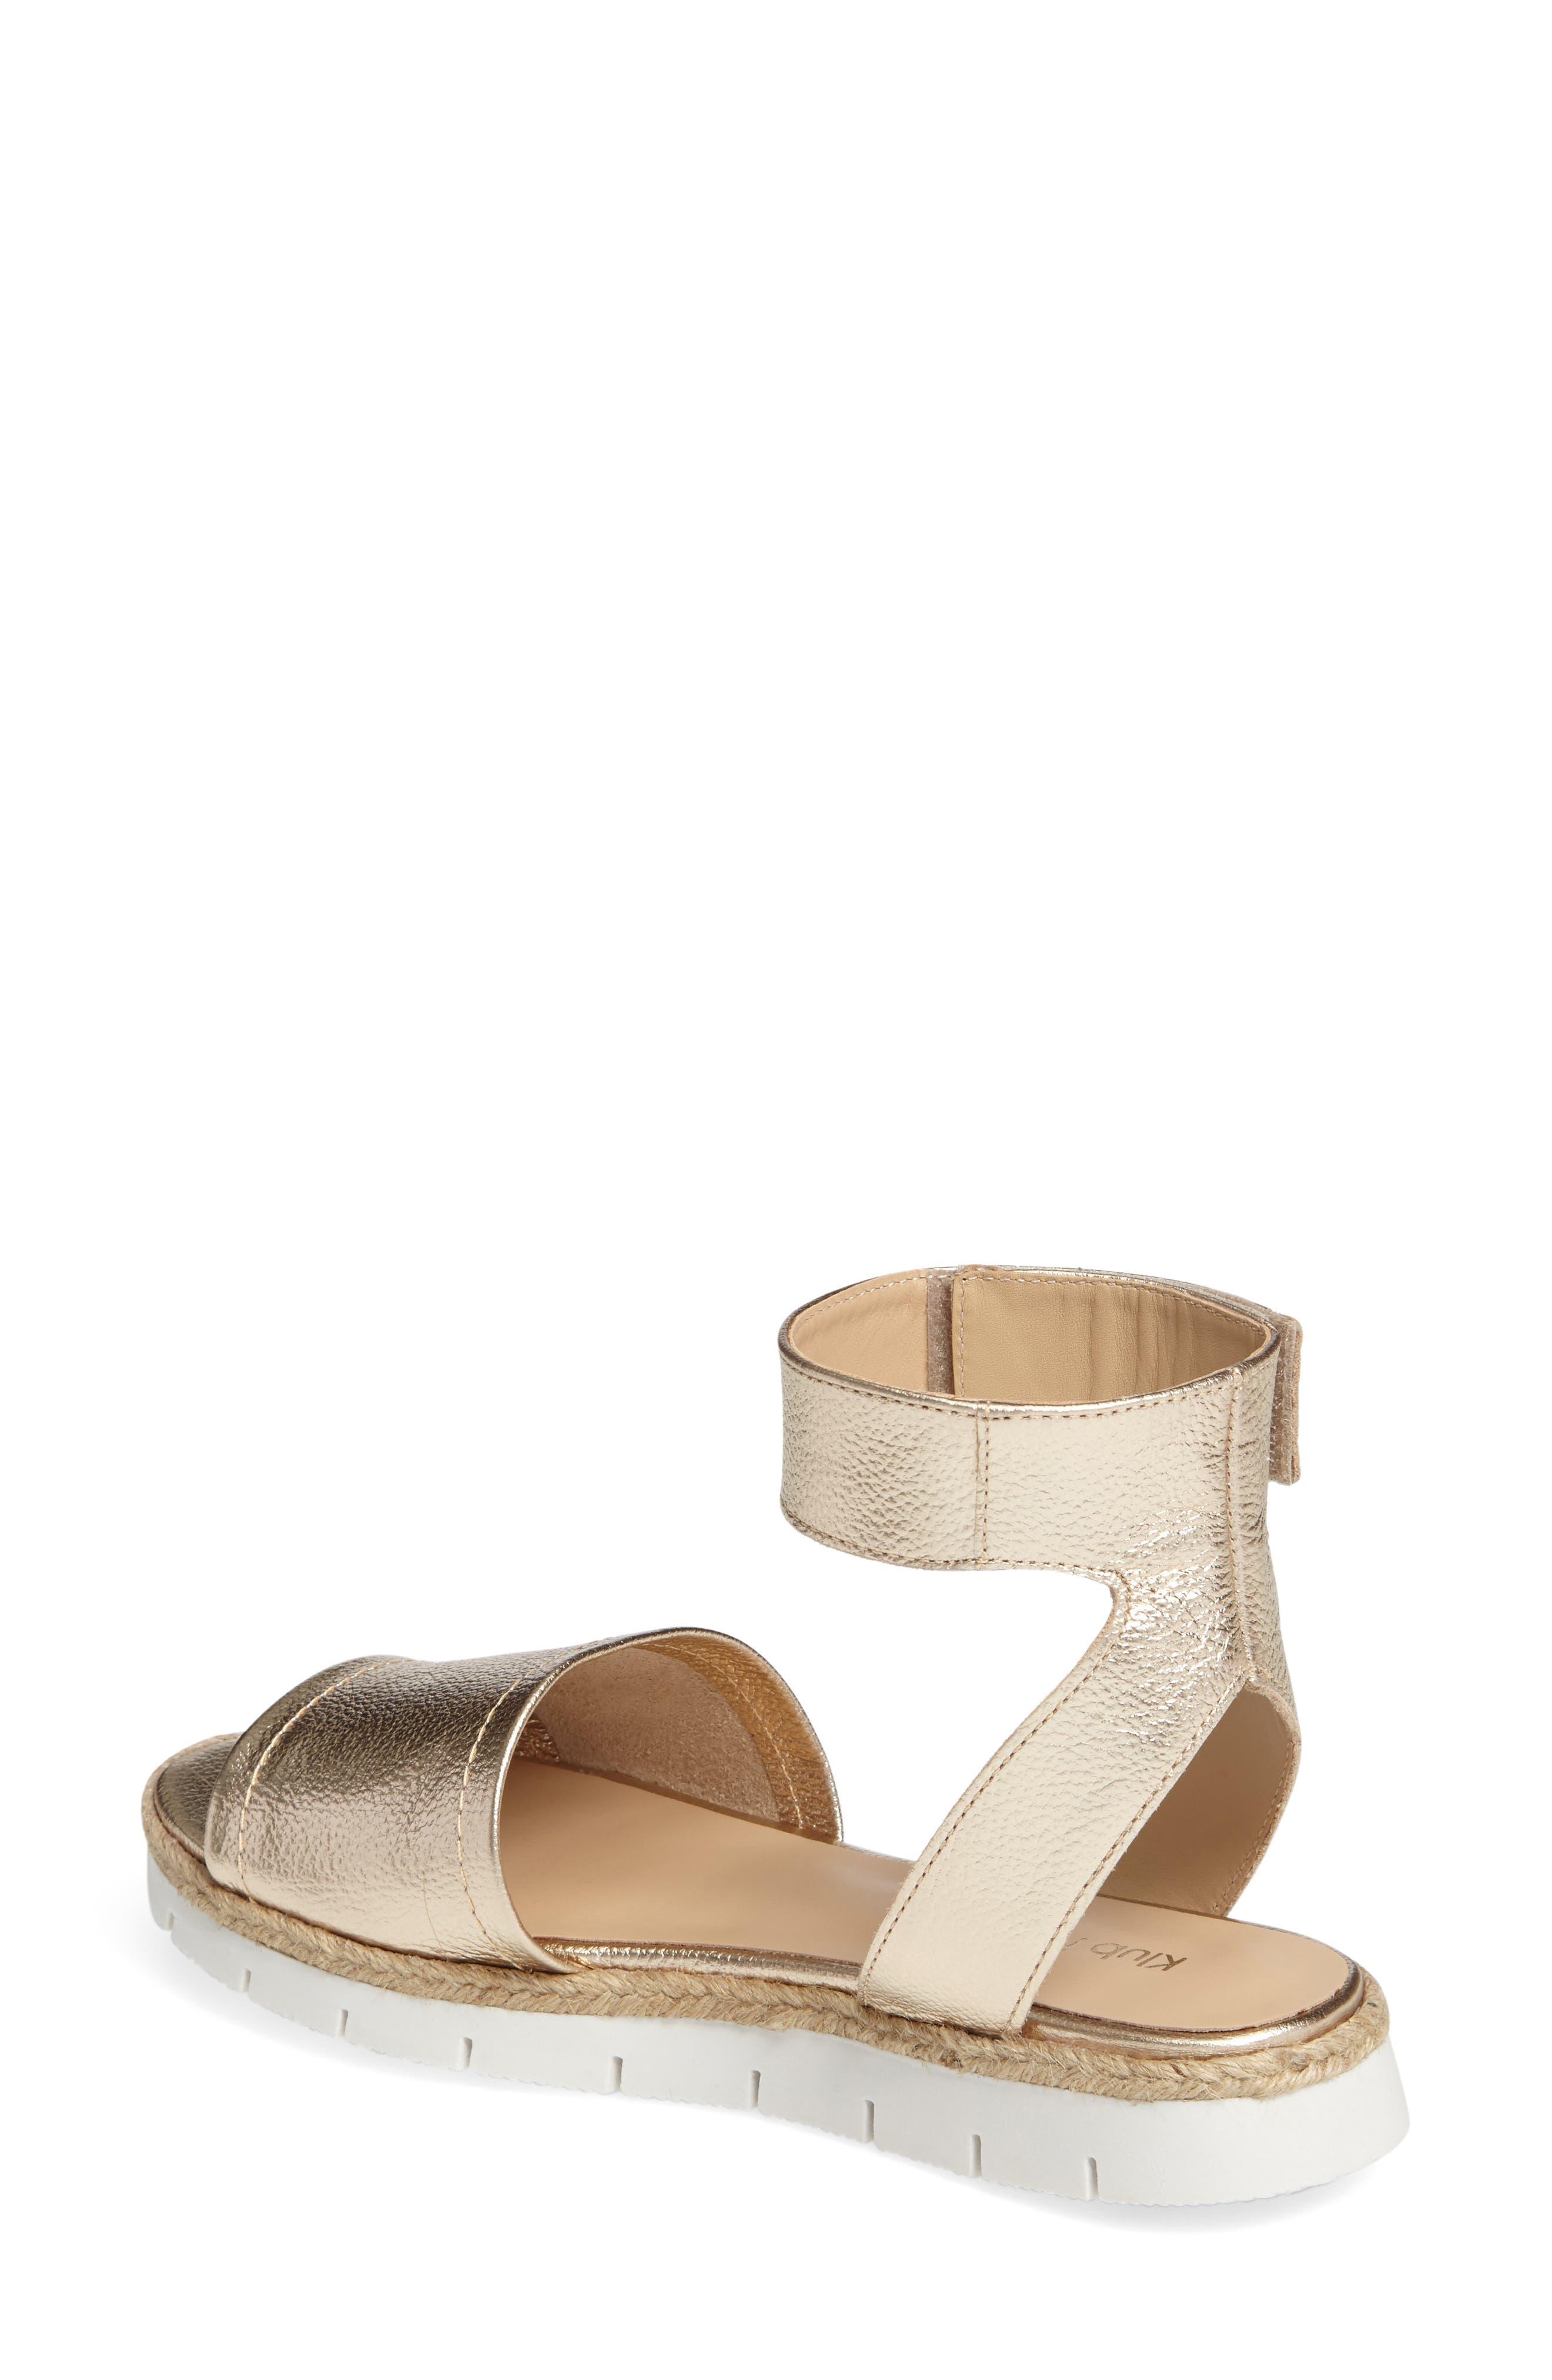 Cleo Platform Sandal,                             Alternate thumbnail 7, color,